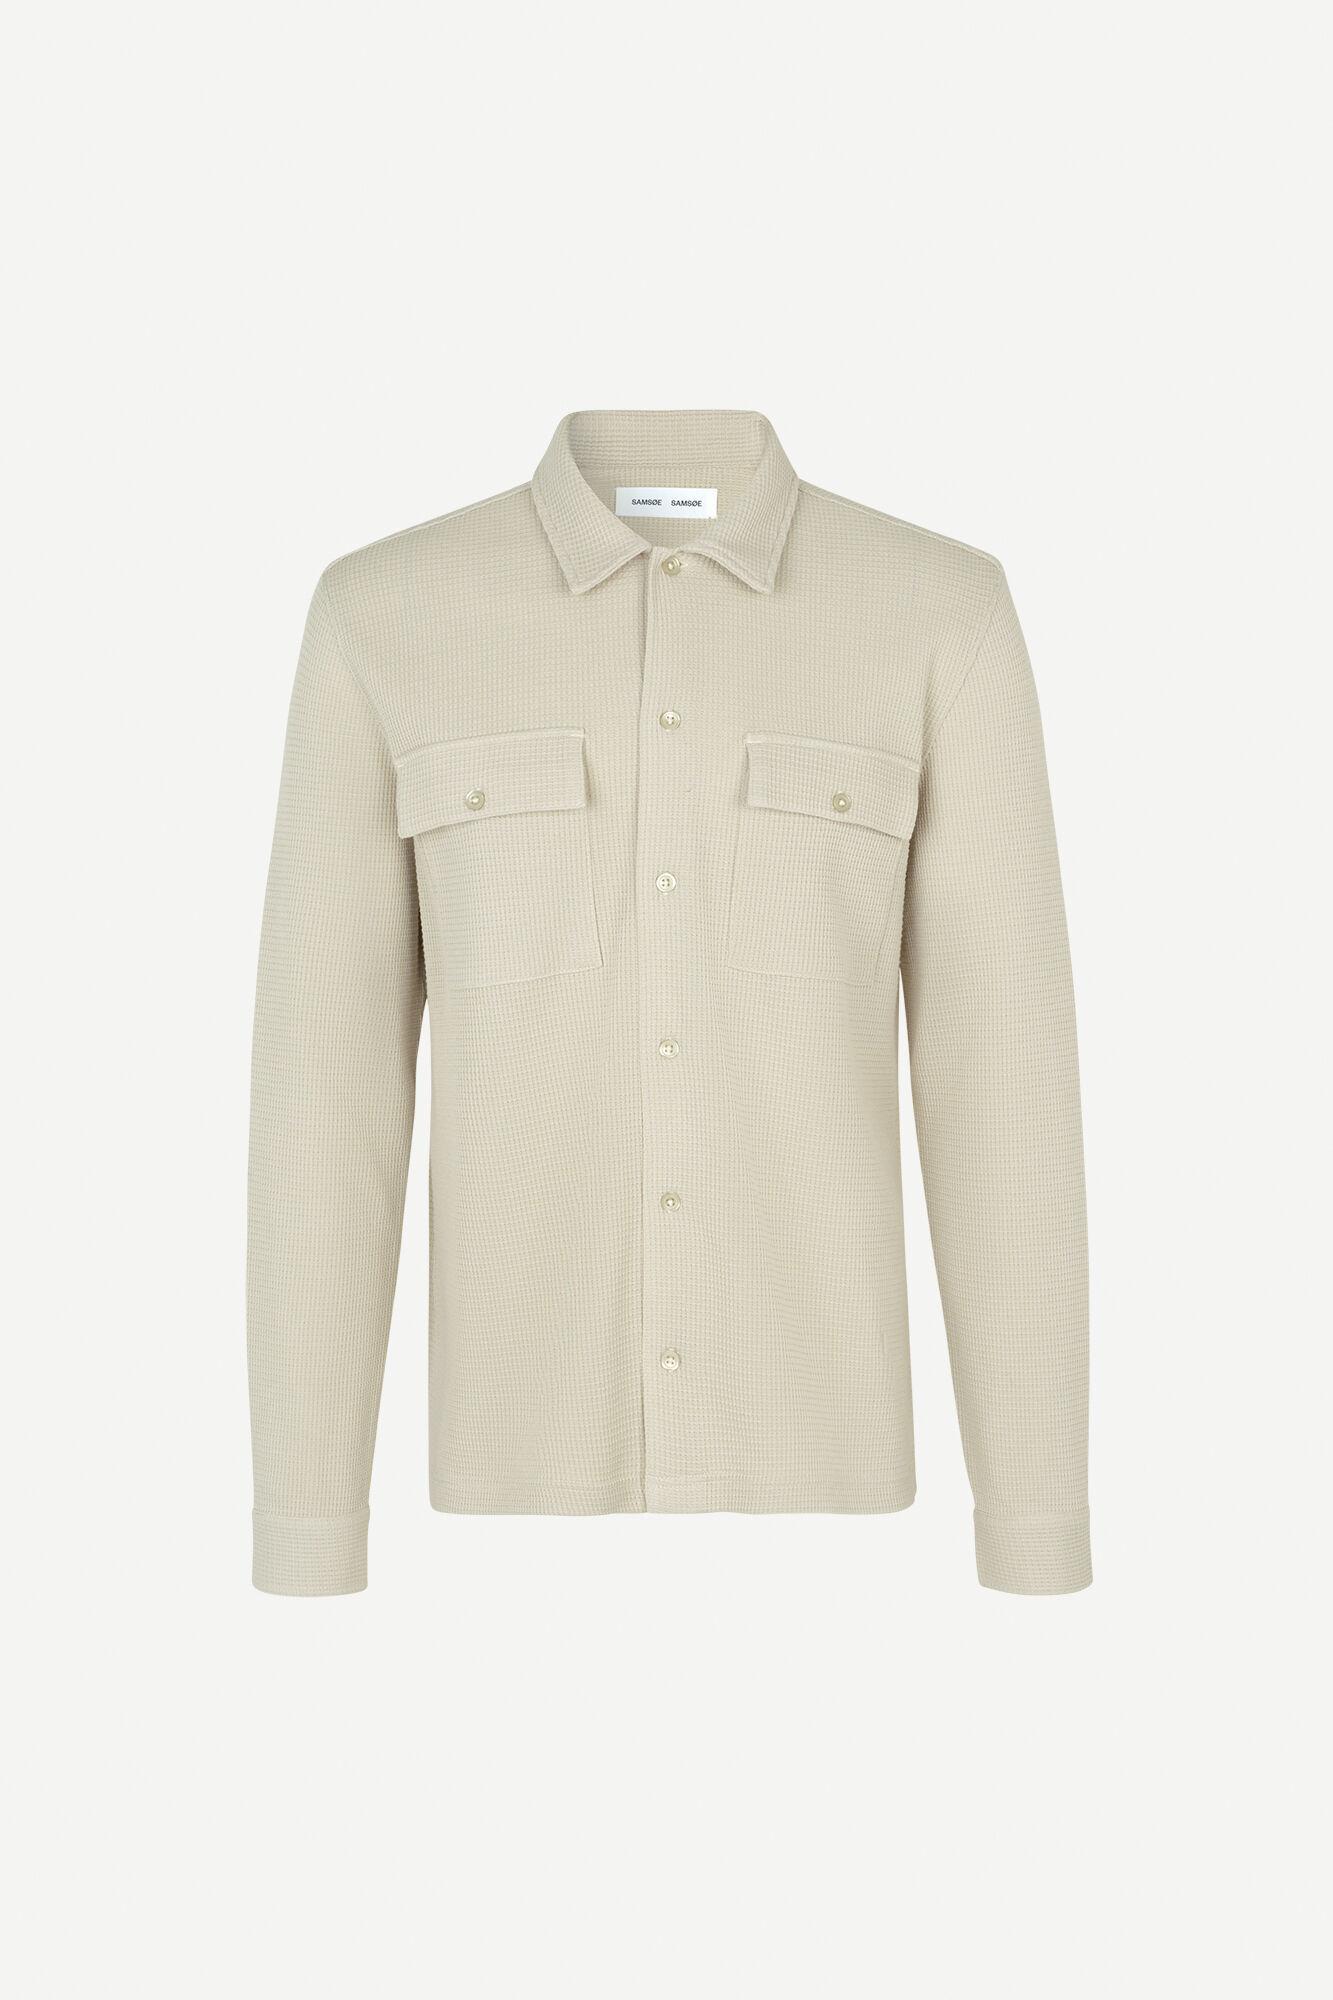 Dayo geweven overhemd in ecru 11586-1